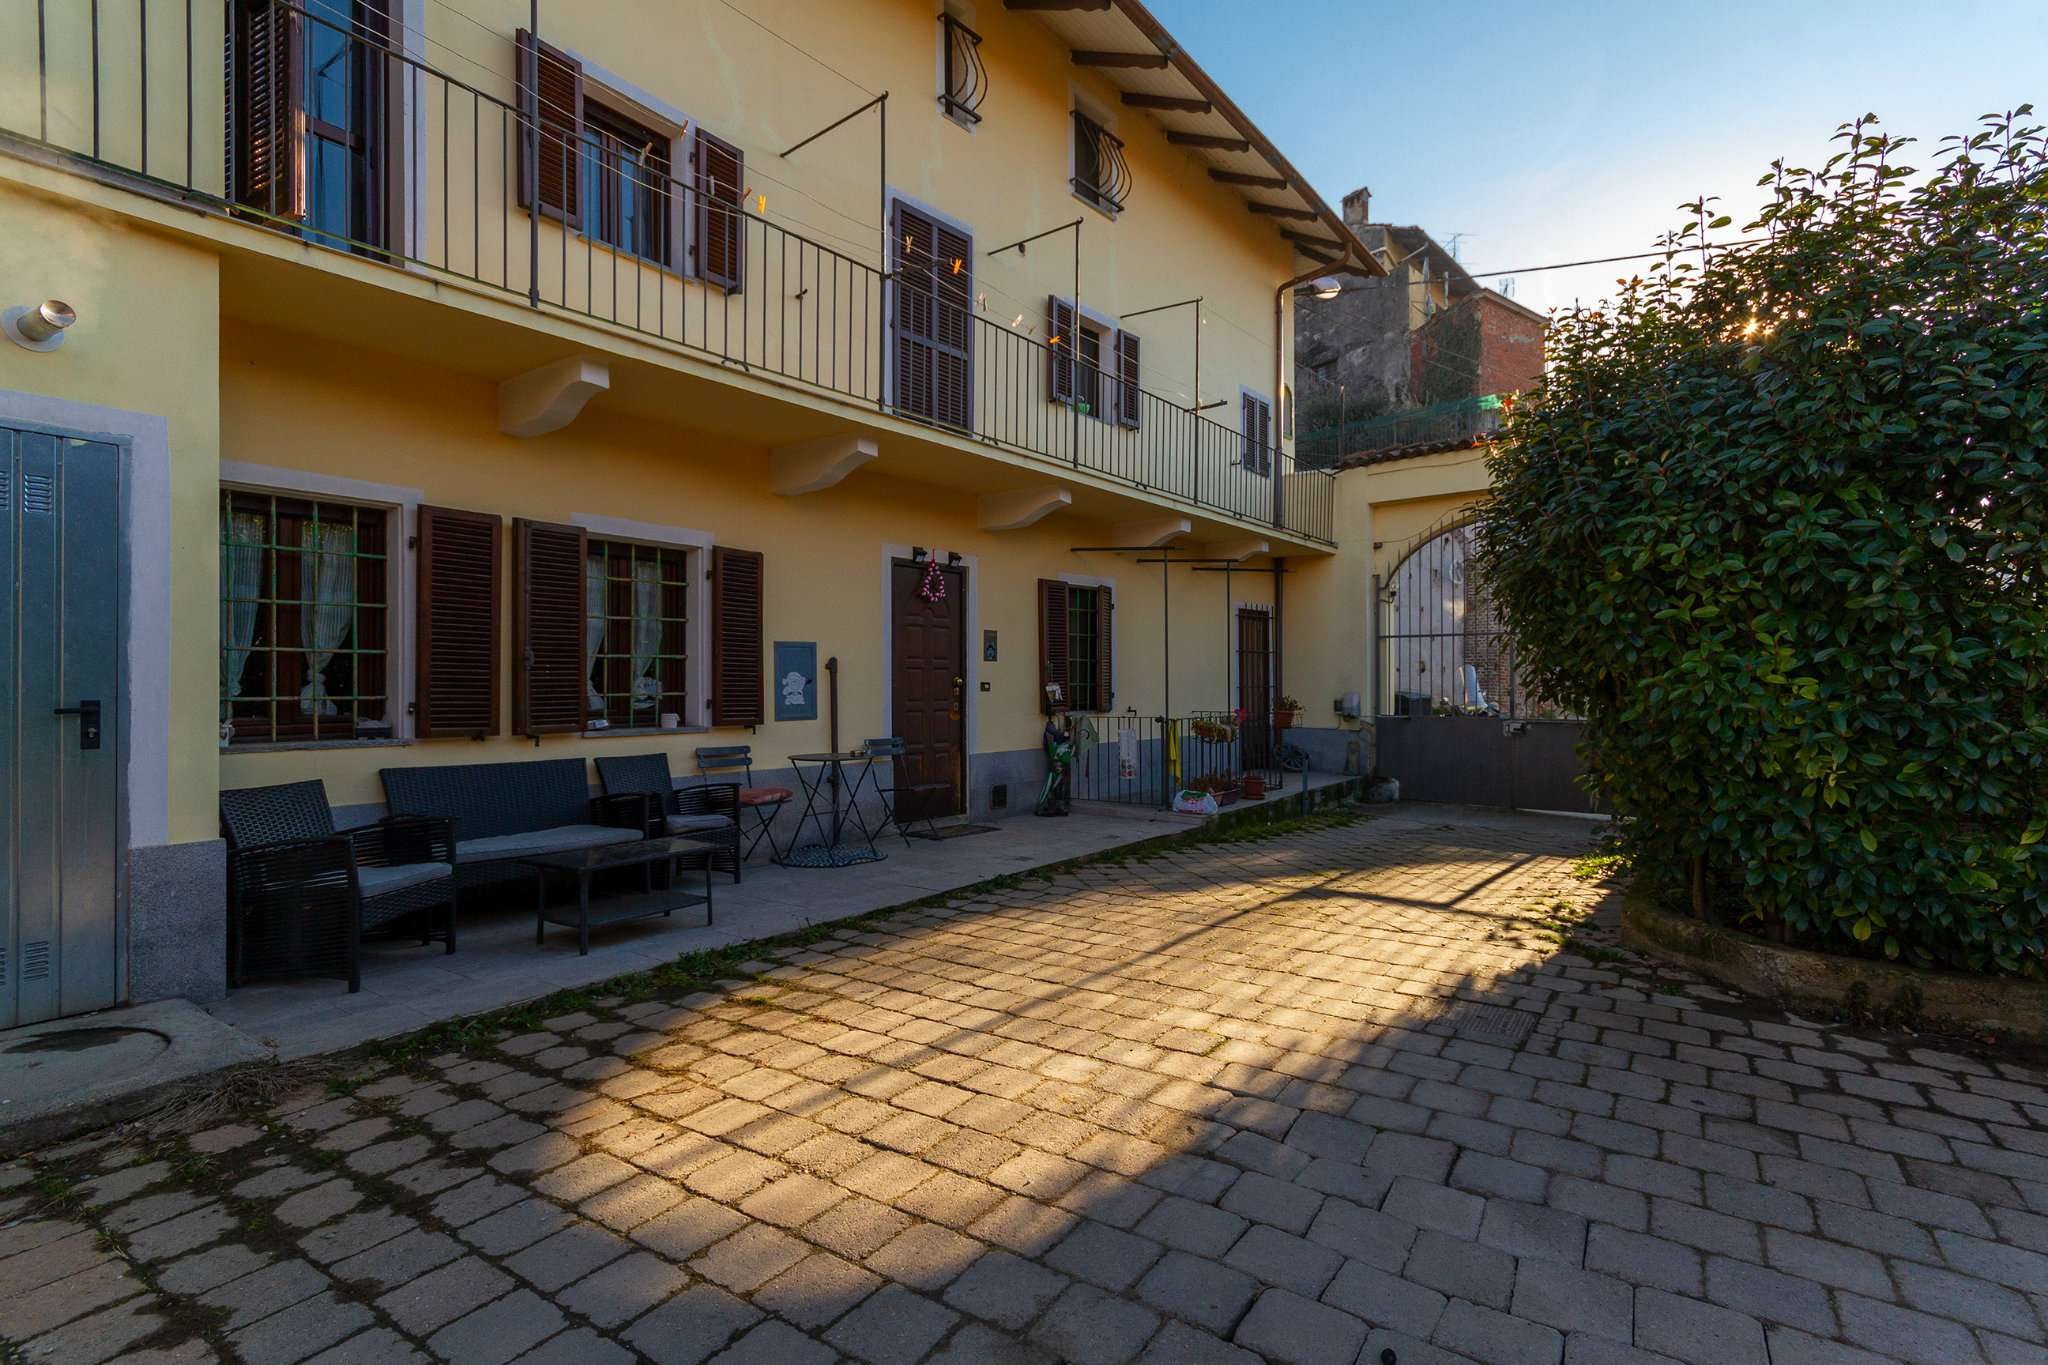 Villetta a Schiera in vendita via Bricca 4 Pianezza